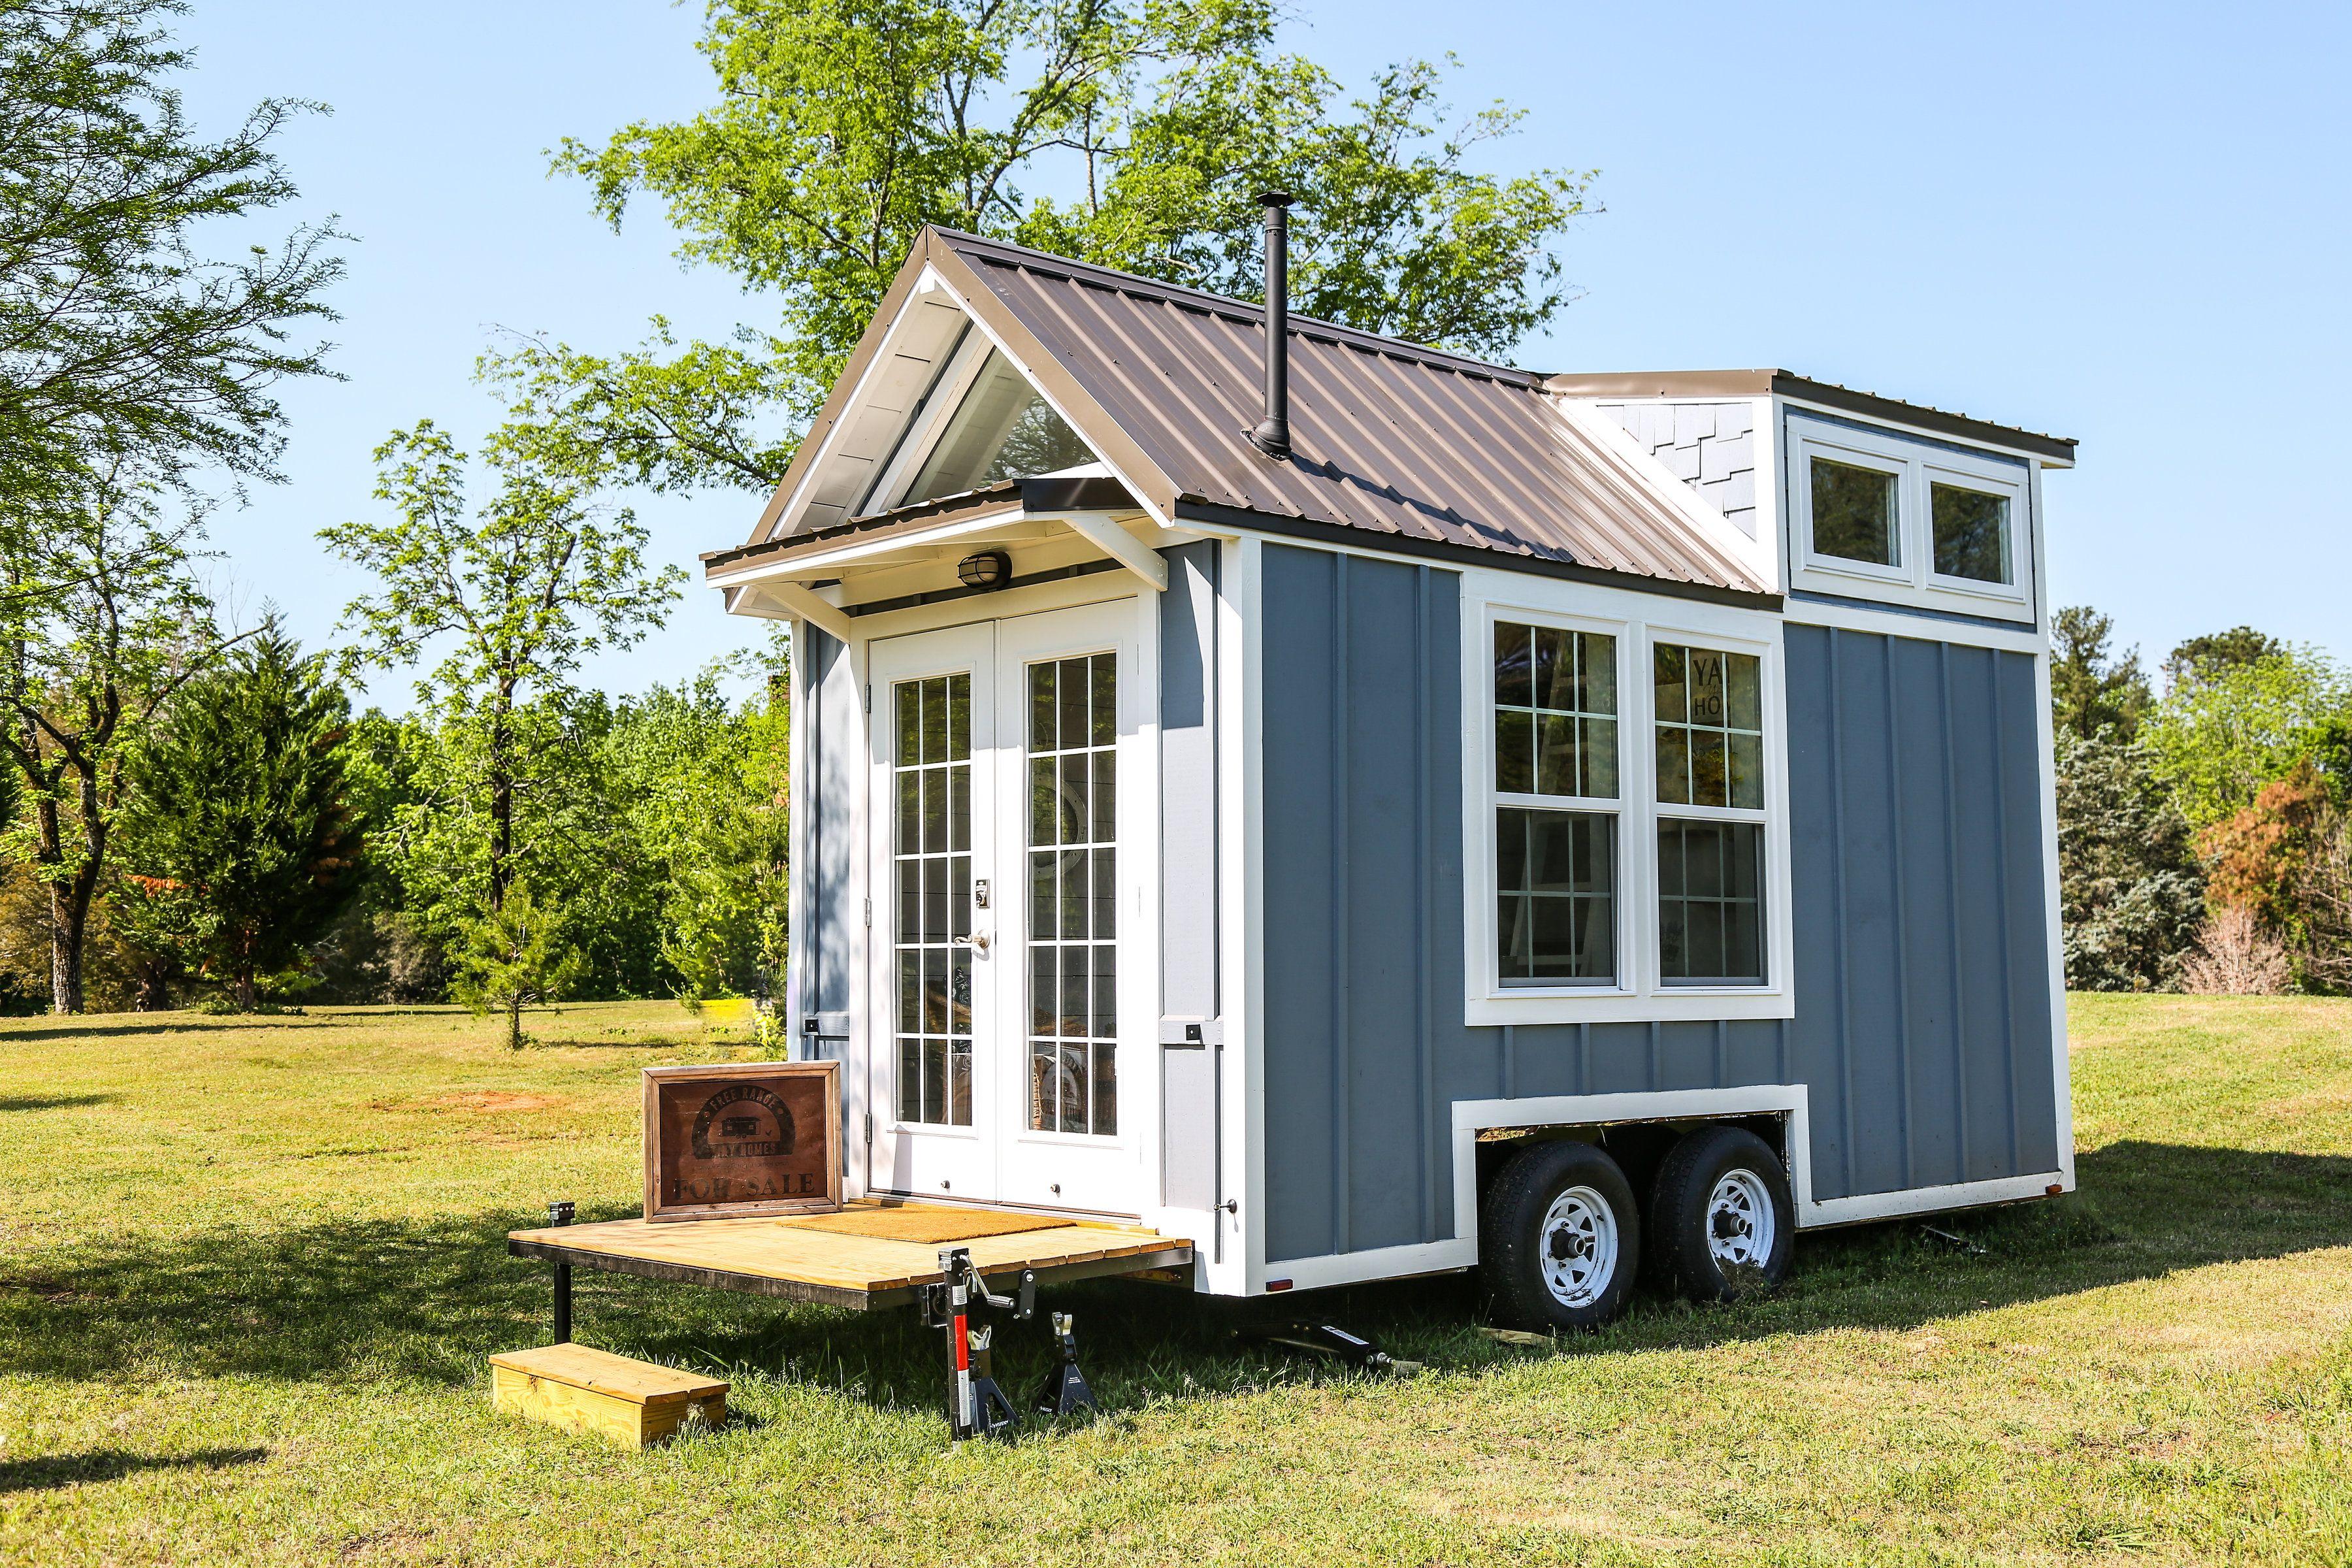 Free Range 16ft Custom Cottage Tiny House For Sale In Eatonton